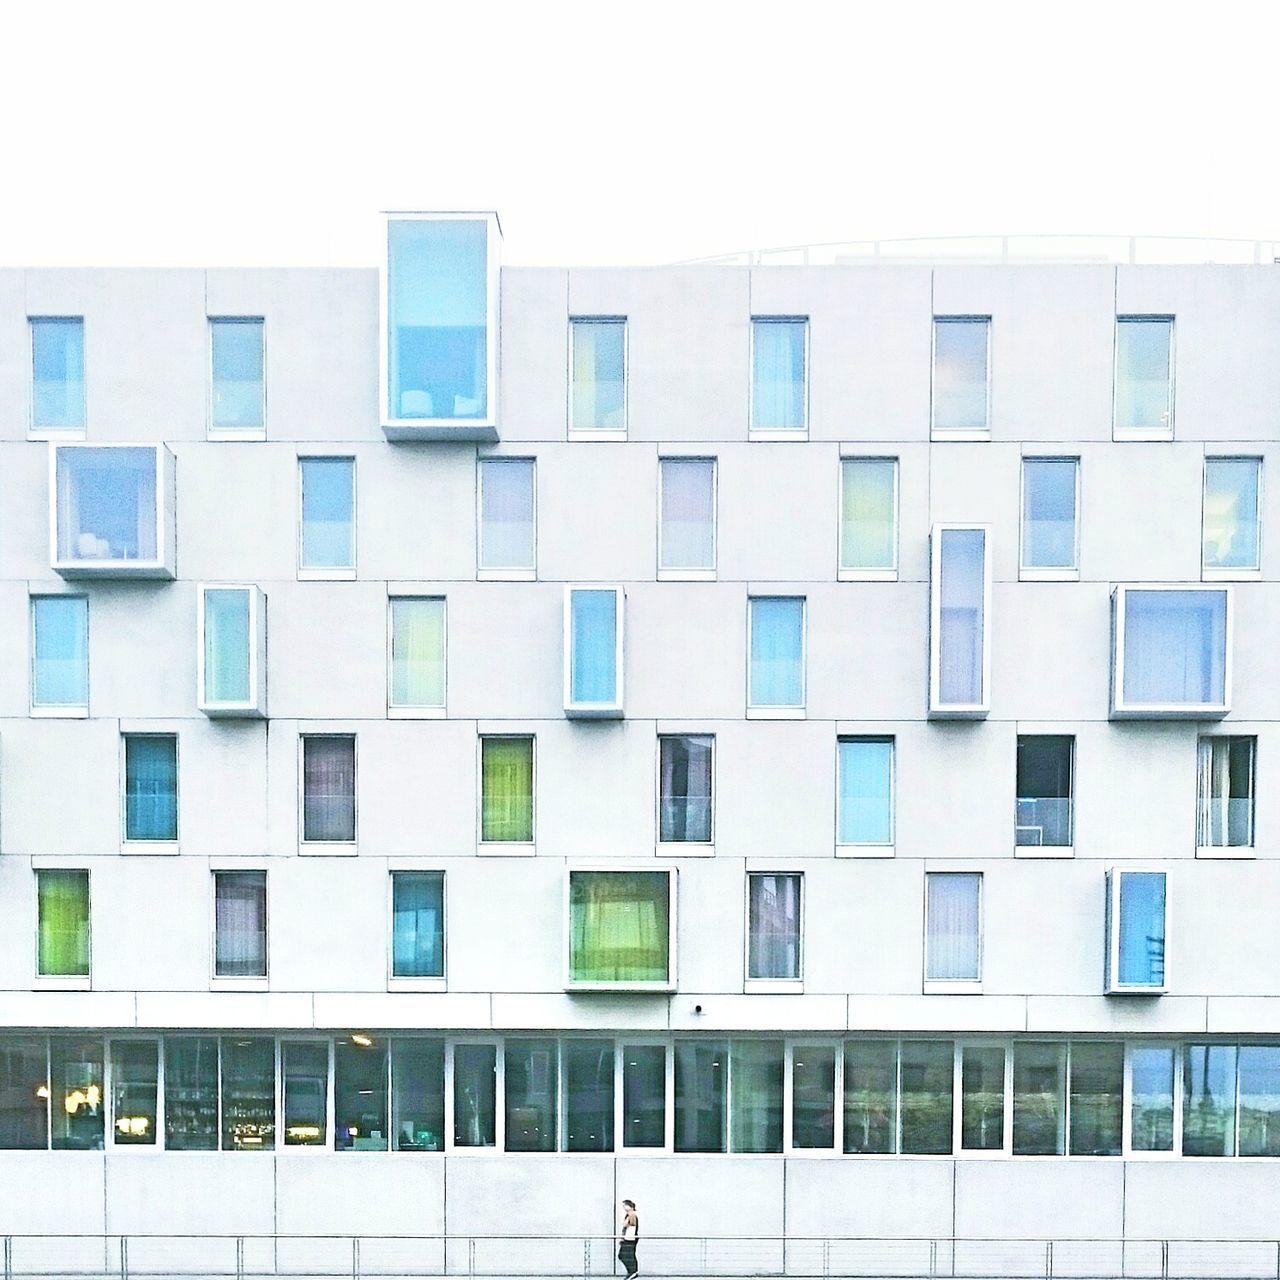 Strideby 🚶. Cologne Minimalism Lines Minimal Desig Art Structures Architecturelovers Design Symmetry Architecture Symmetrical Germany Facade Building Facades ARCHITECT